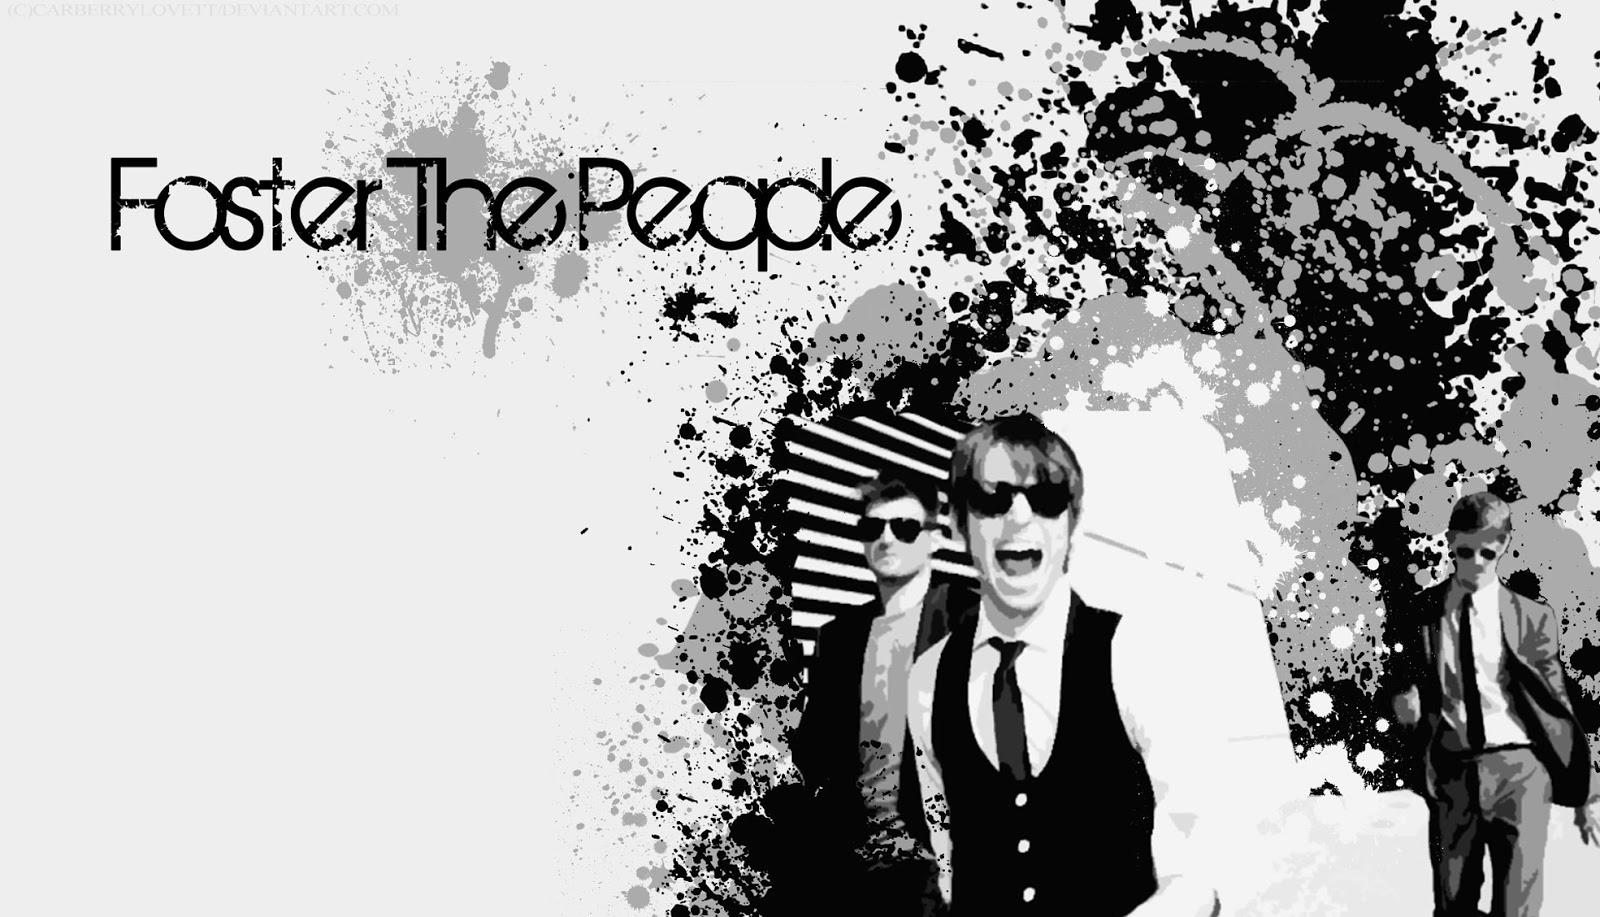 http://4.bp.blogspot.com/-_GtNJ-HF0ww/URklO87dQ6I/AAAAAAAABN0/mIhGcnf2bn4/s1600/Foster+The+People+Wallpaper+2.jpg